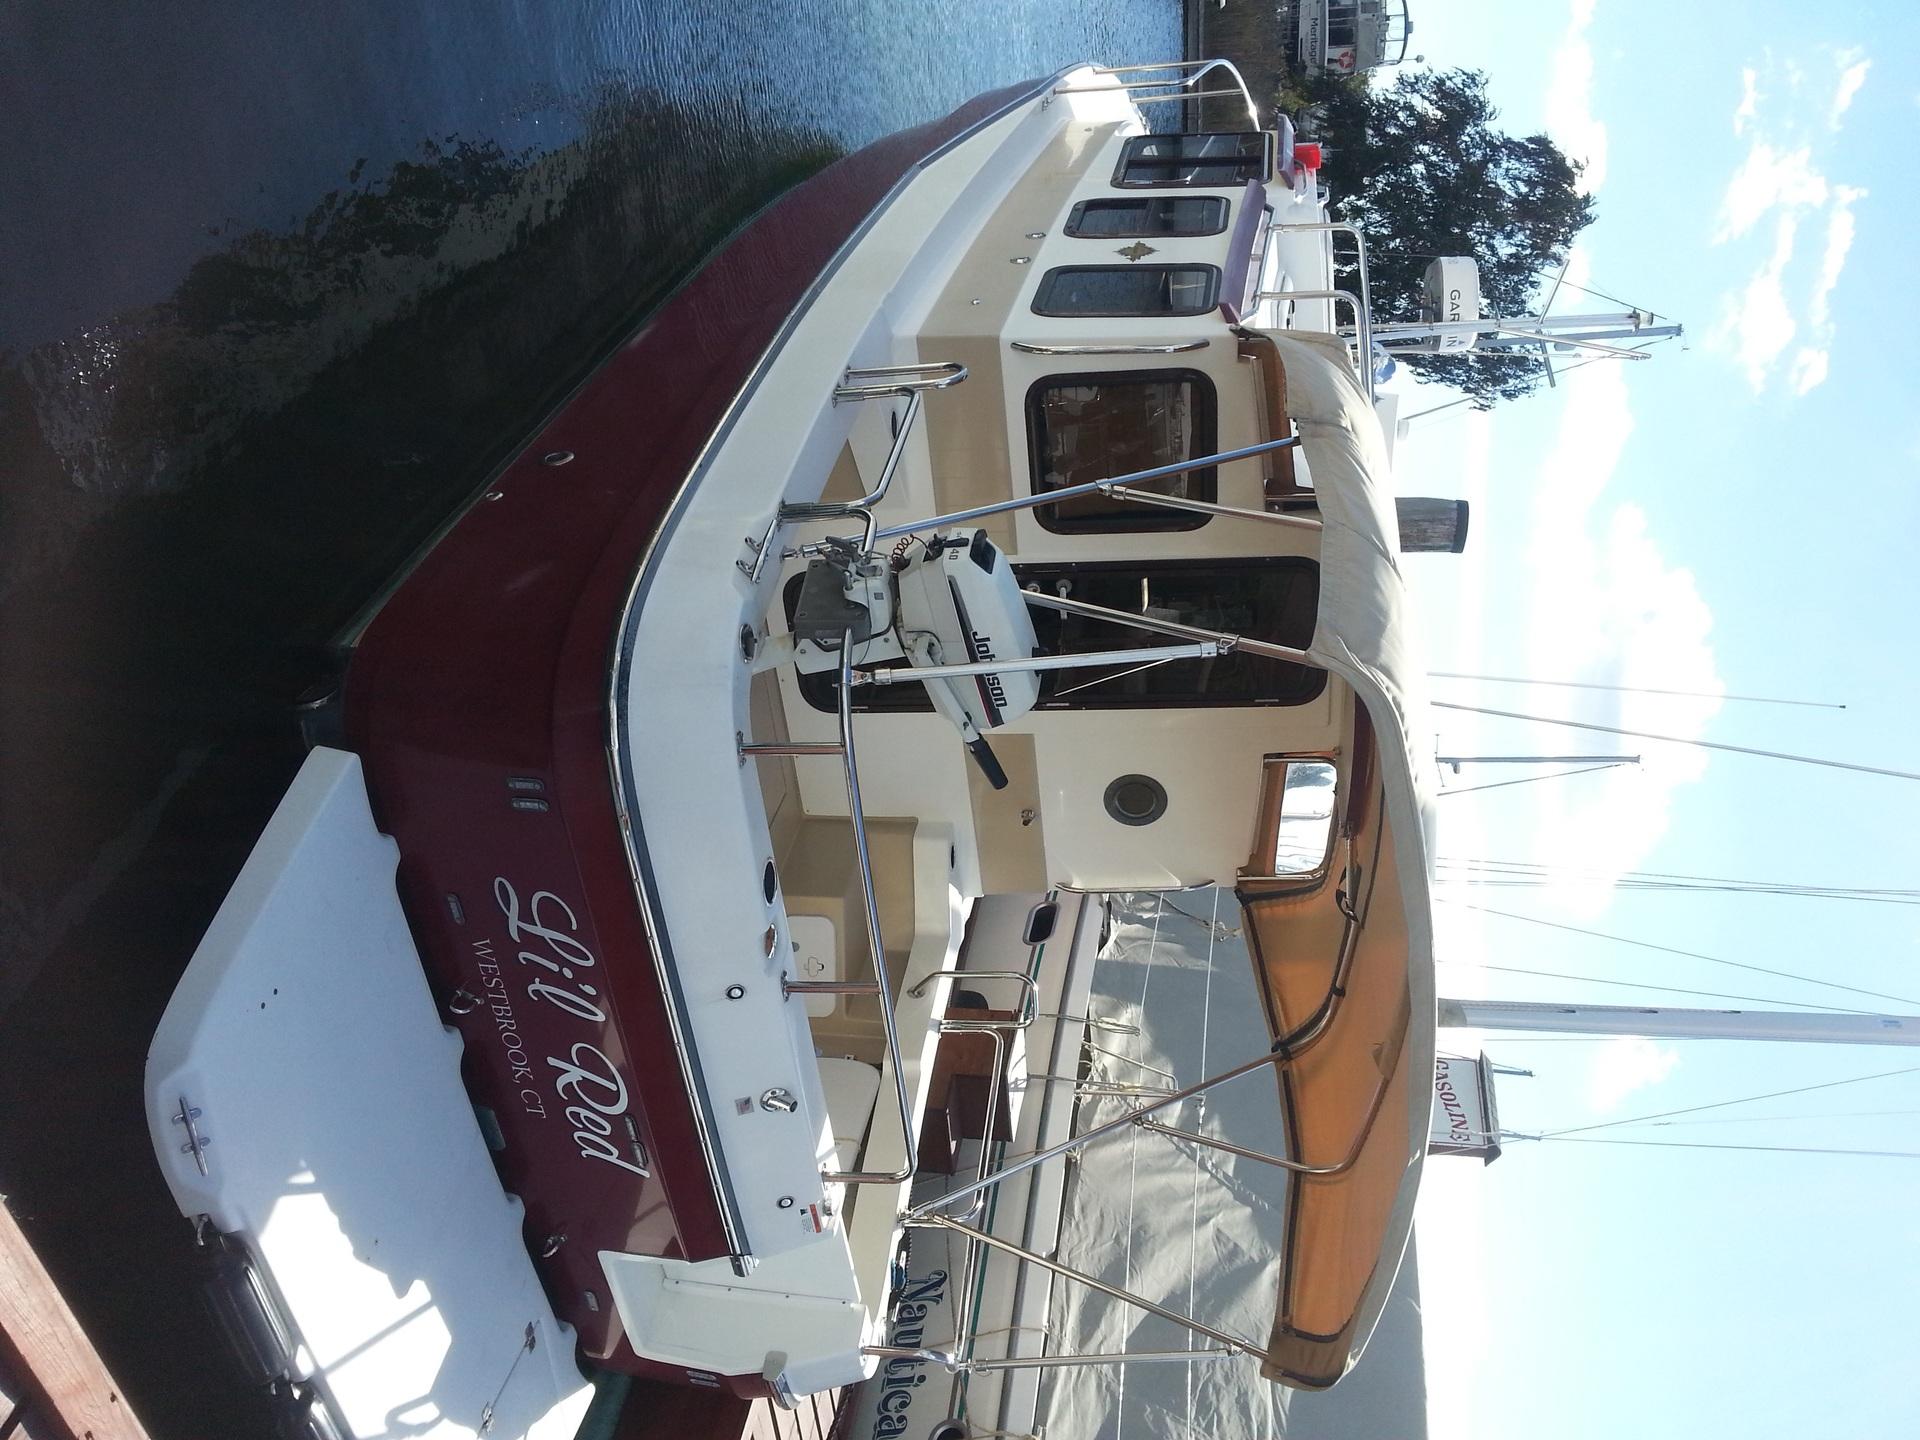 Winter Island Yacht Yard - Ranger Tugs - Used